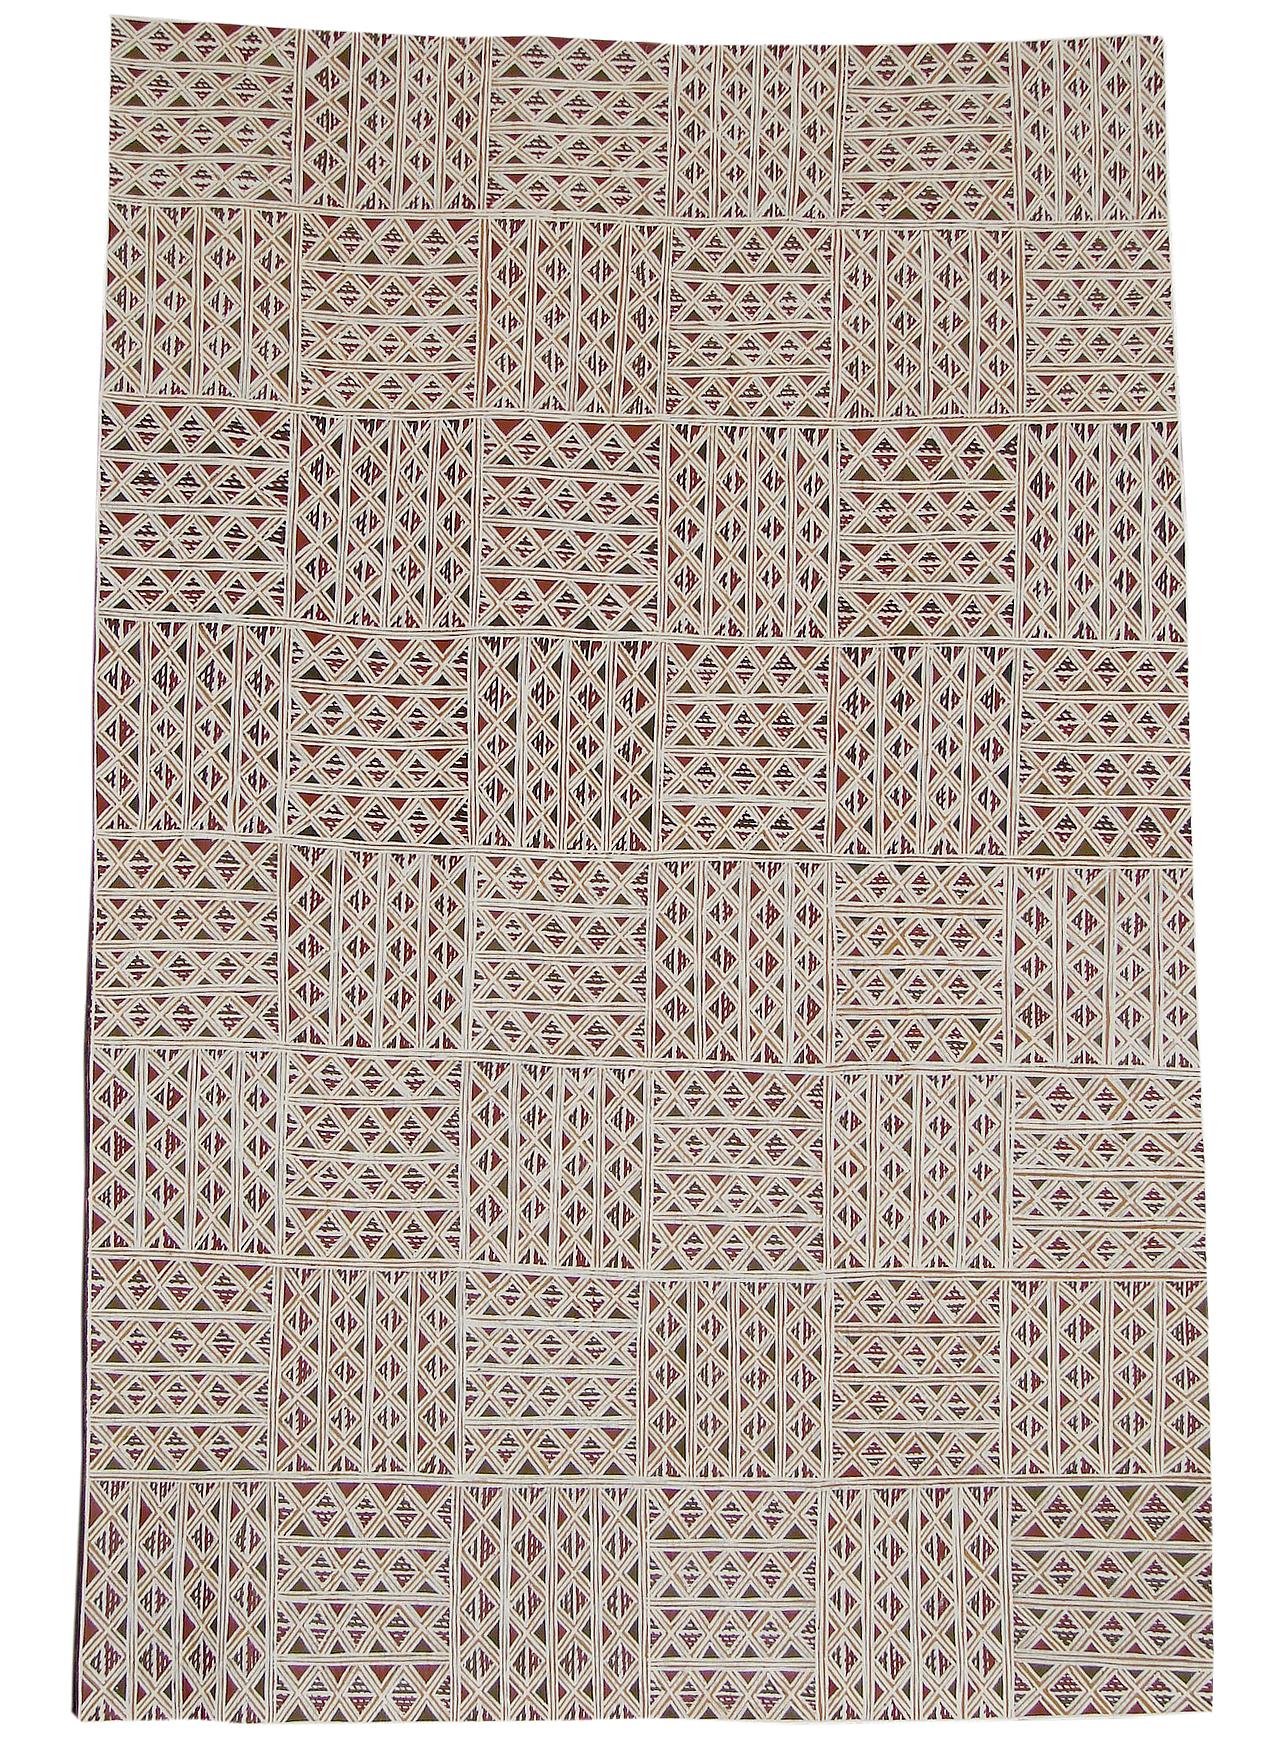 Djirrirra Wunungmurra  Untitled  Natural earth pigments on bark 75 x 65cm  Buku Larrnggay Mulka #4035T   EMAIL INQUIRY